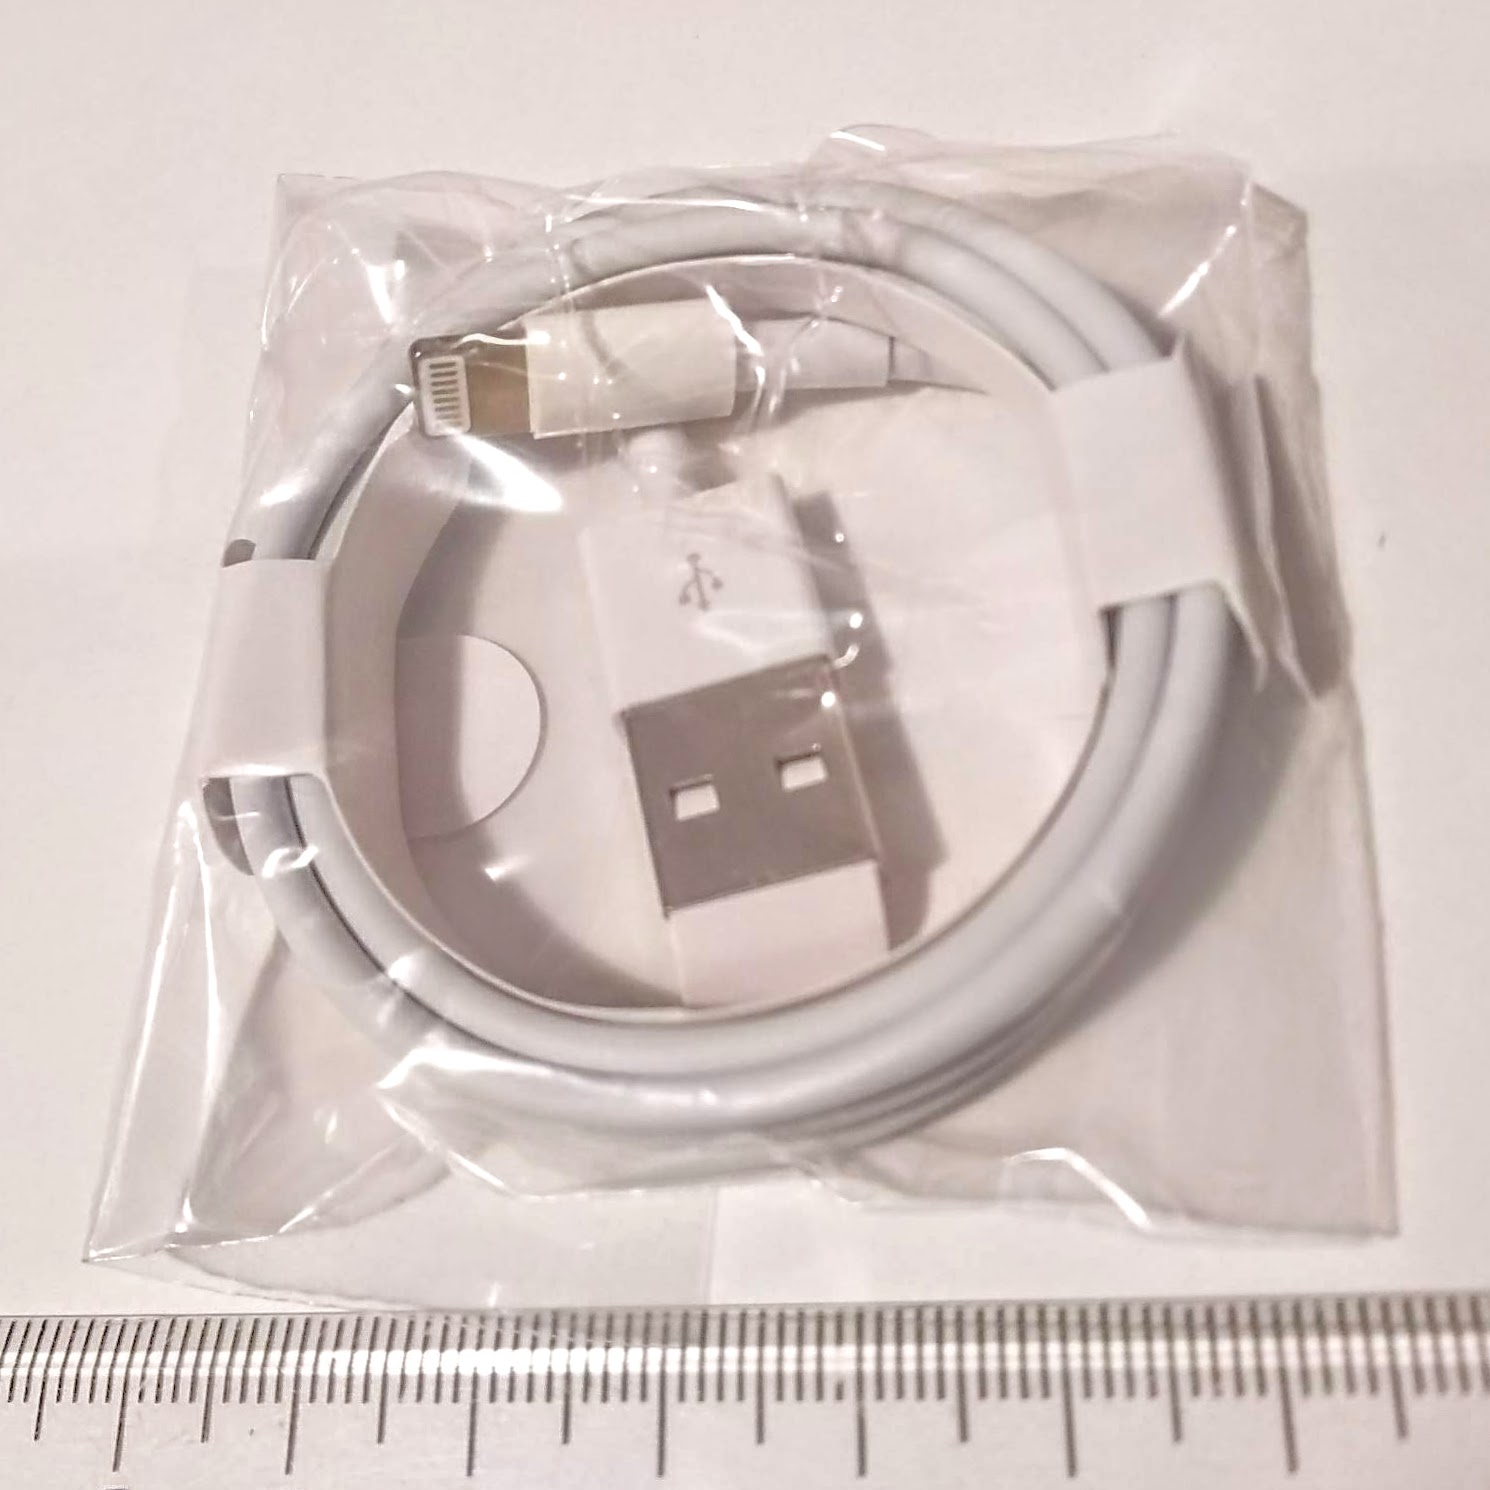 iphone ライトニング Lightningコネクタ - 即出荷 高級 1m 白 純正品質 USBケーブル